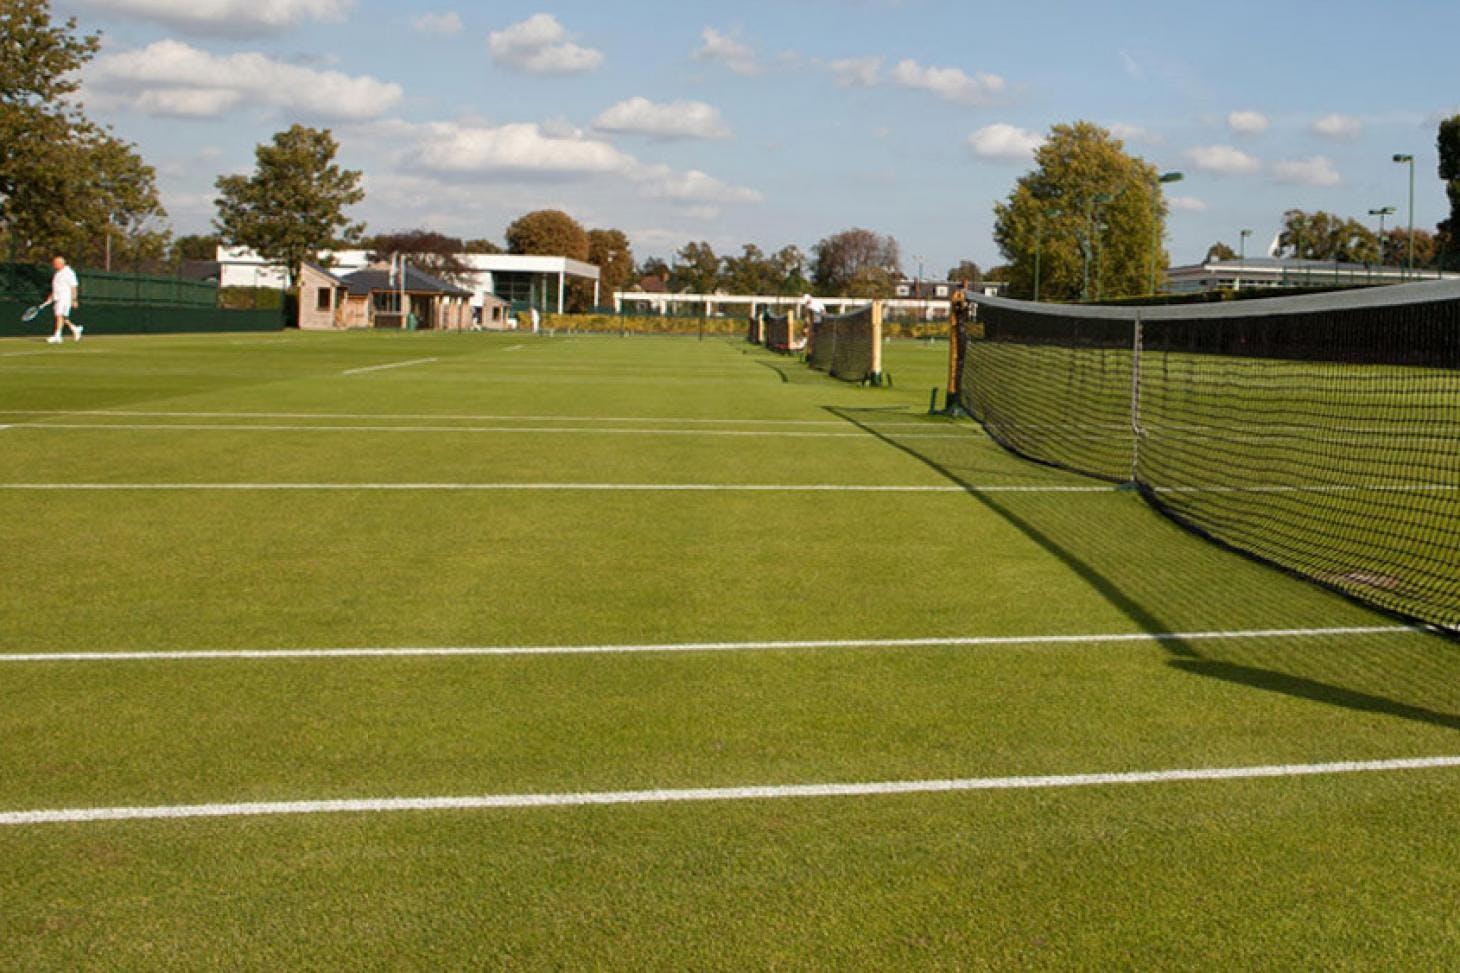 Roehampton Club Outdoor   Grass tennis court